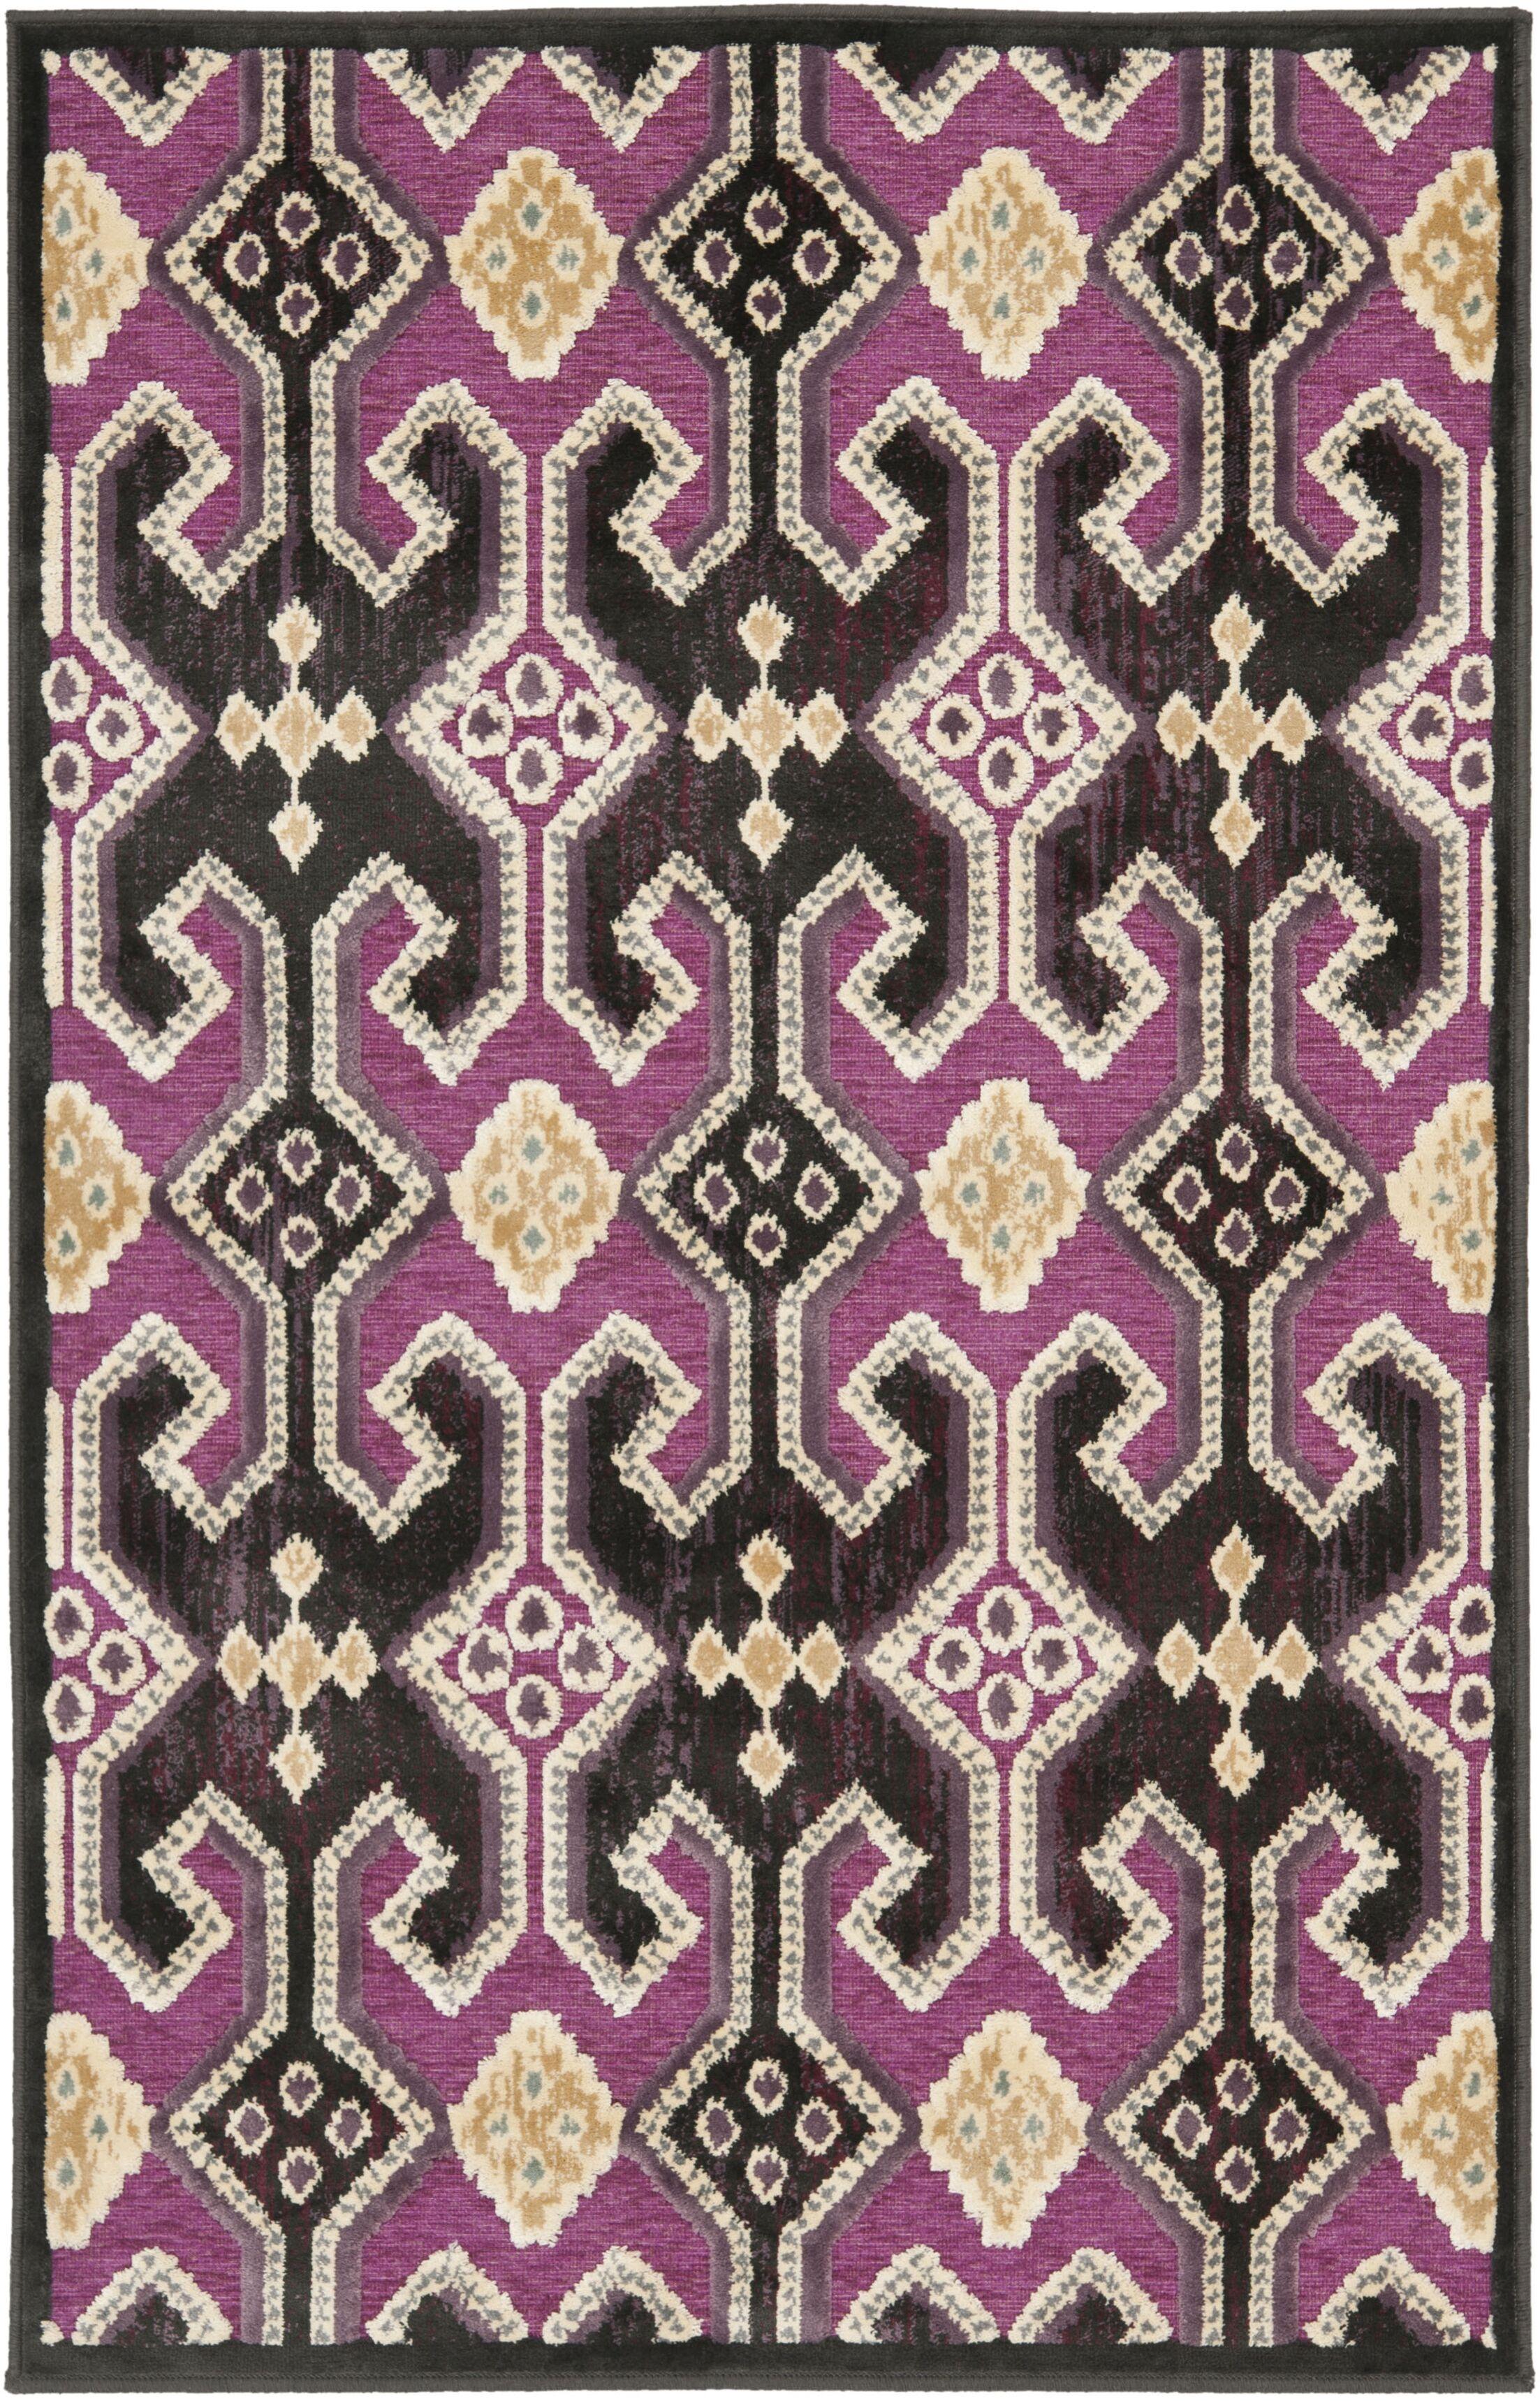 Saint-Michel Anthracite/Fuchisa Area Rug Rug Size: Rectangle 8' x 11'2